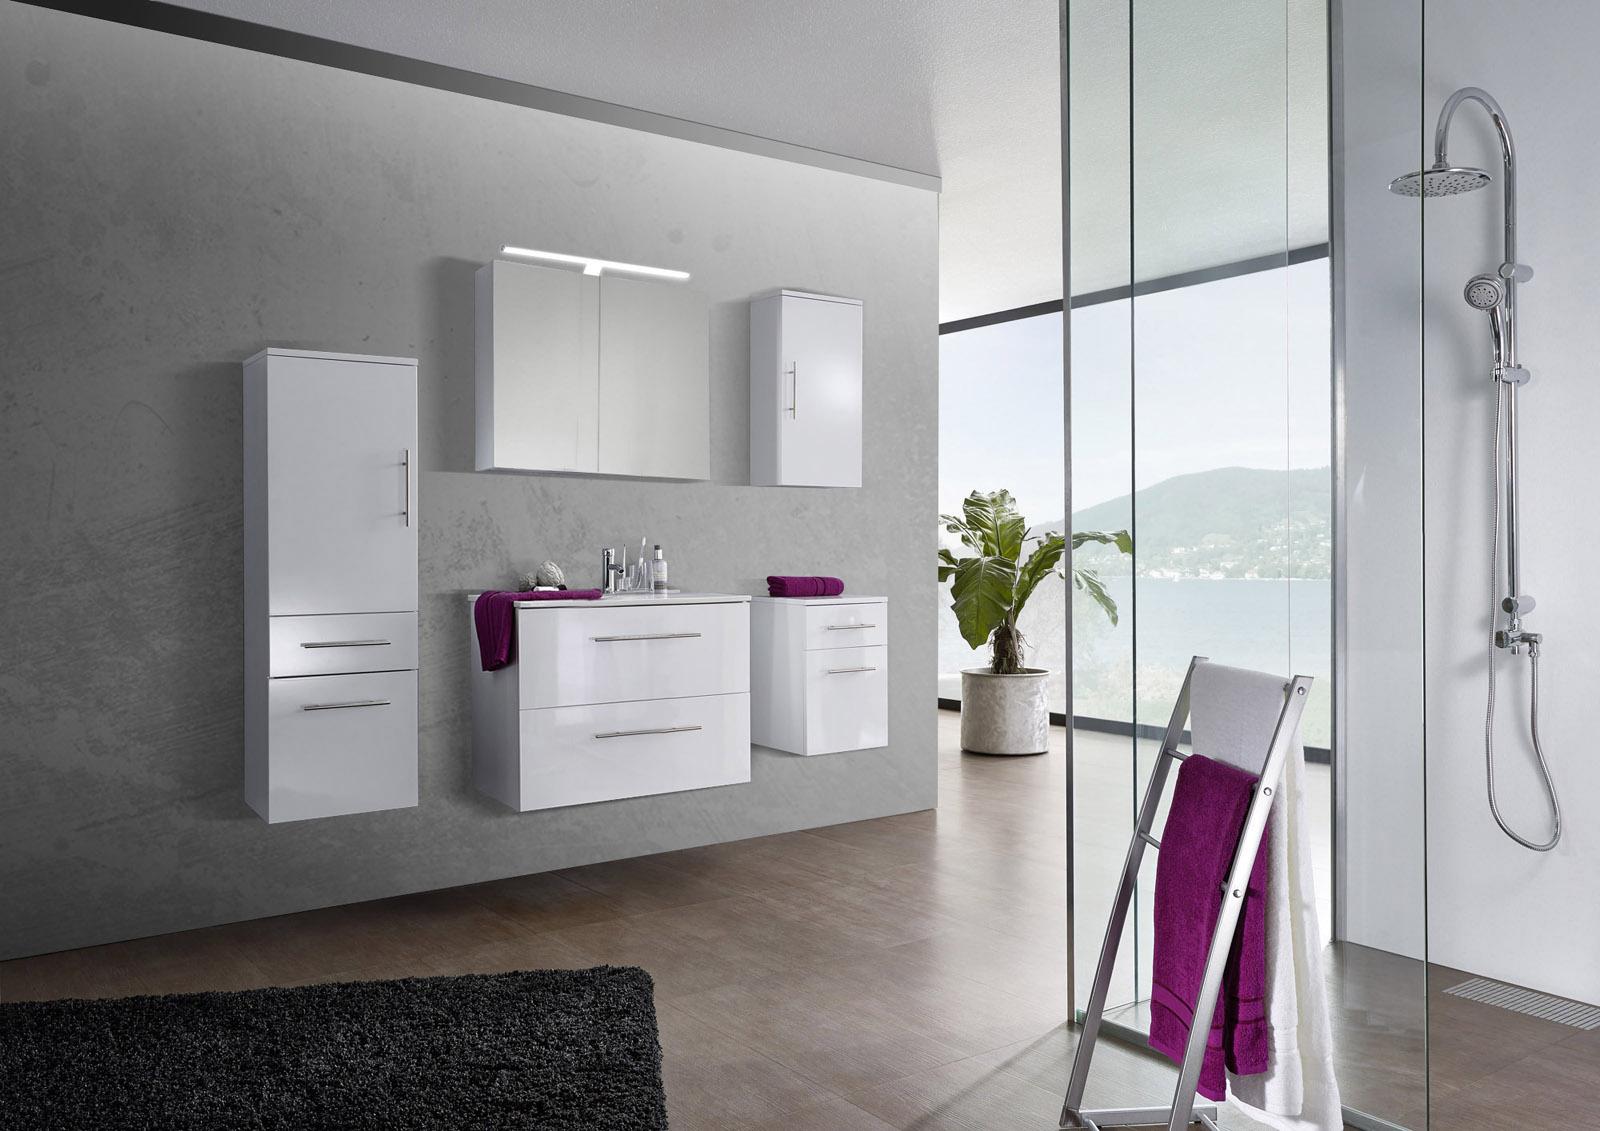 sam 5tlg badezimmer set spiegelschrank wei 80 cm verena demn chst. Black Bedroom Furniture Sets. Home Design Ideas